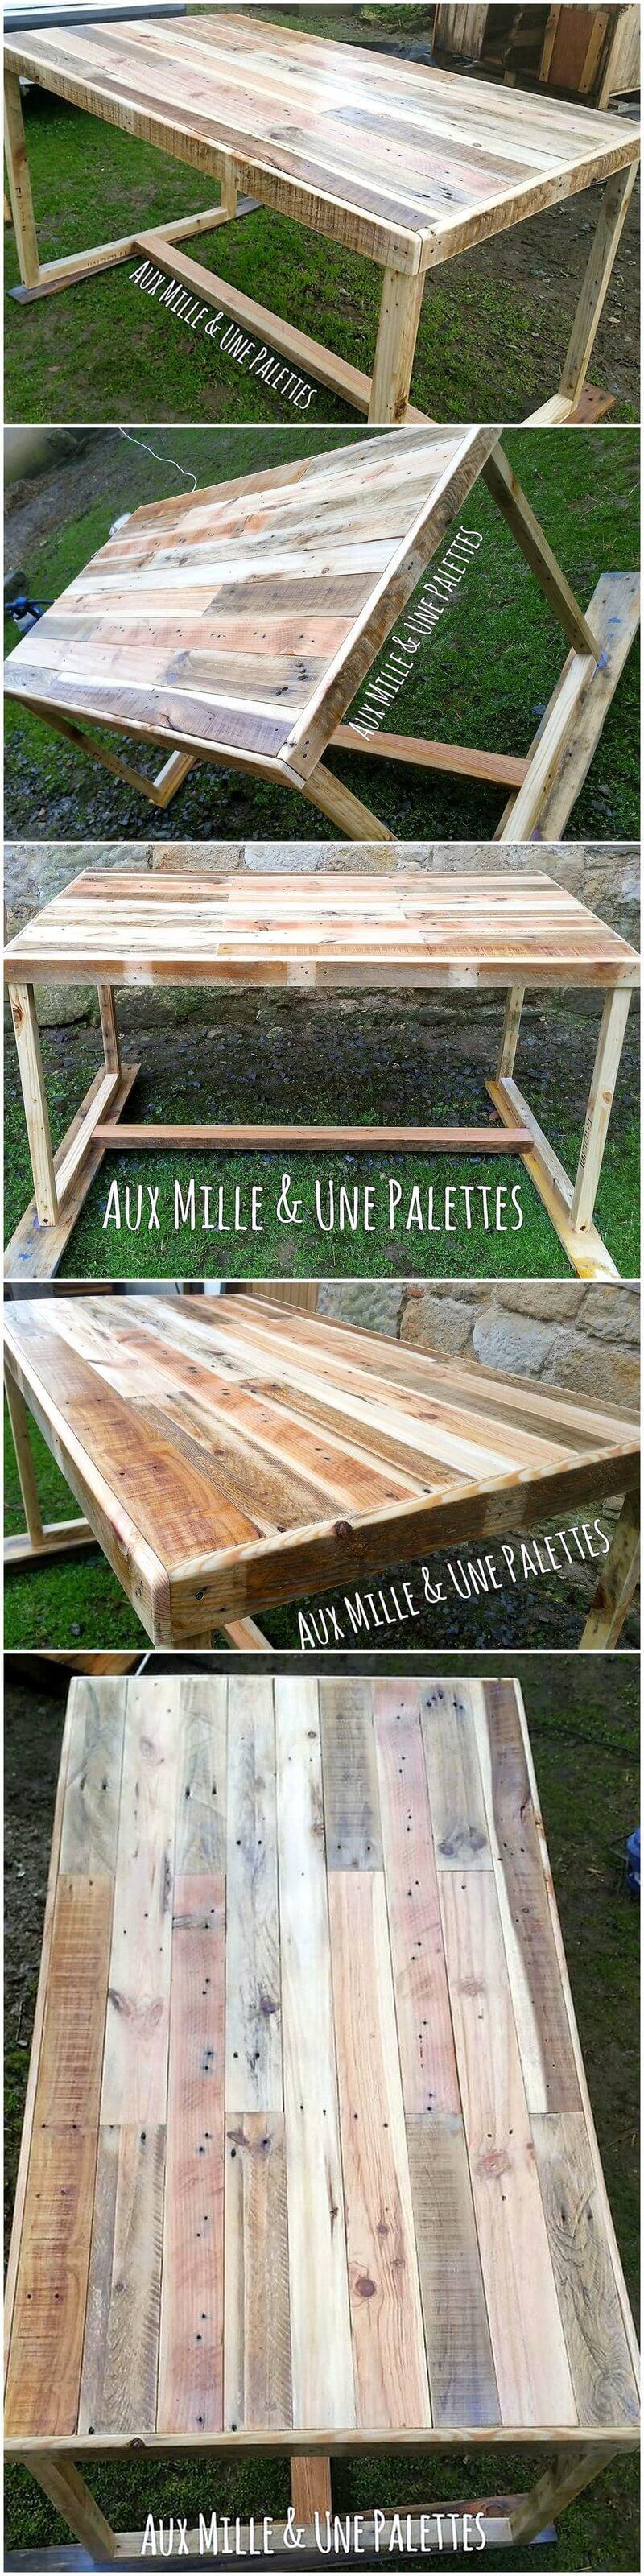 pallet wooden table idea